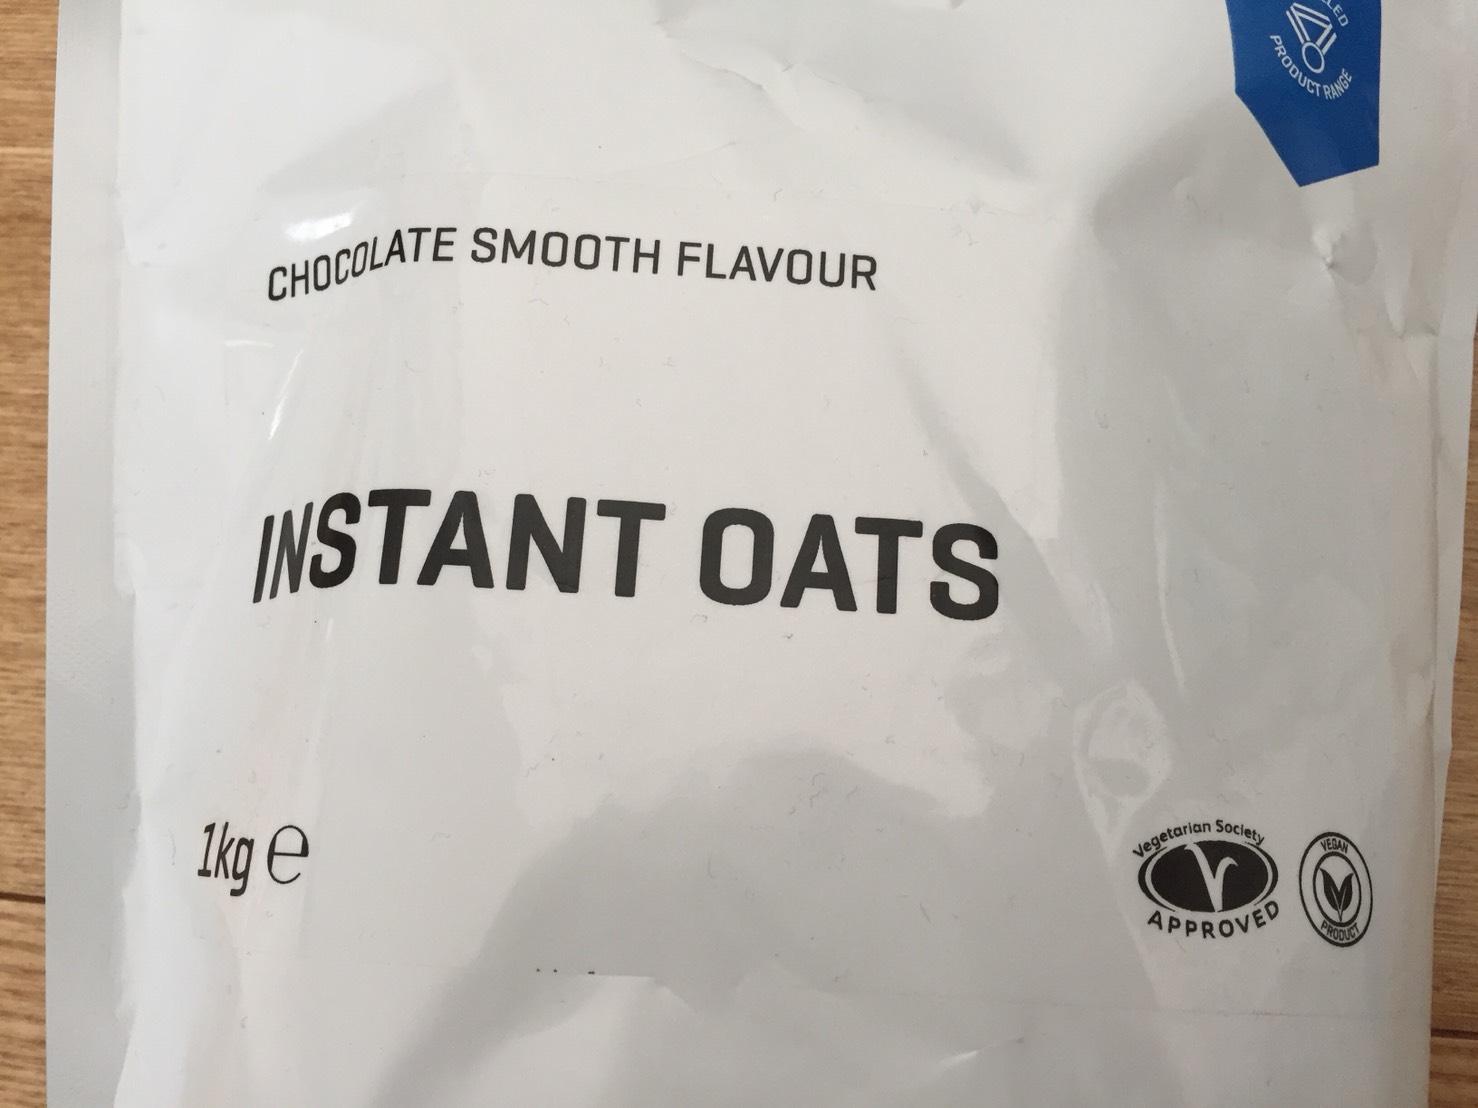 INSTANT OATS(インスタントオーツ)CHOCOLATE SMOOTH FLAVOUR(チョコレートスムース味)の成分表